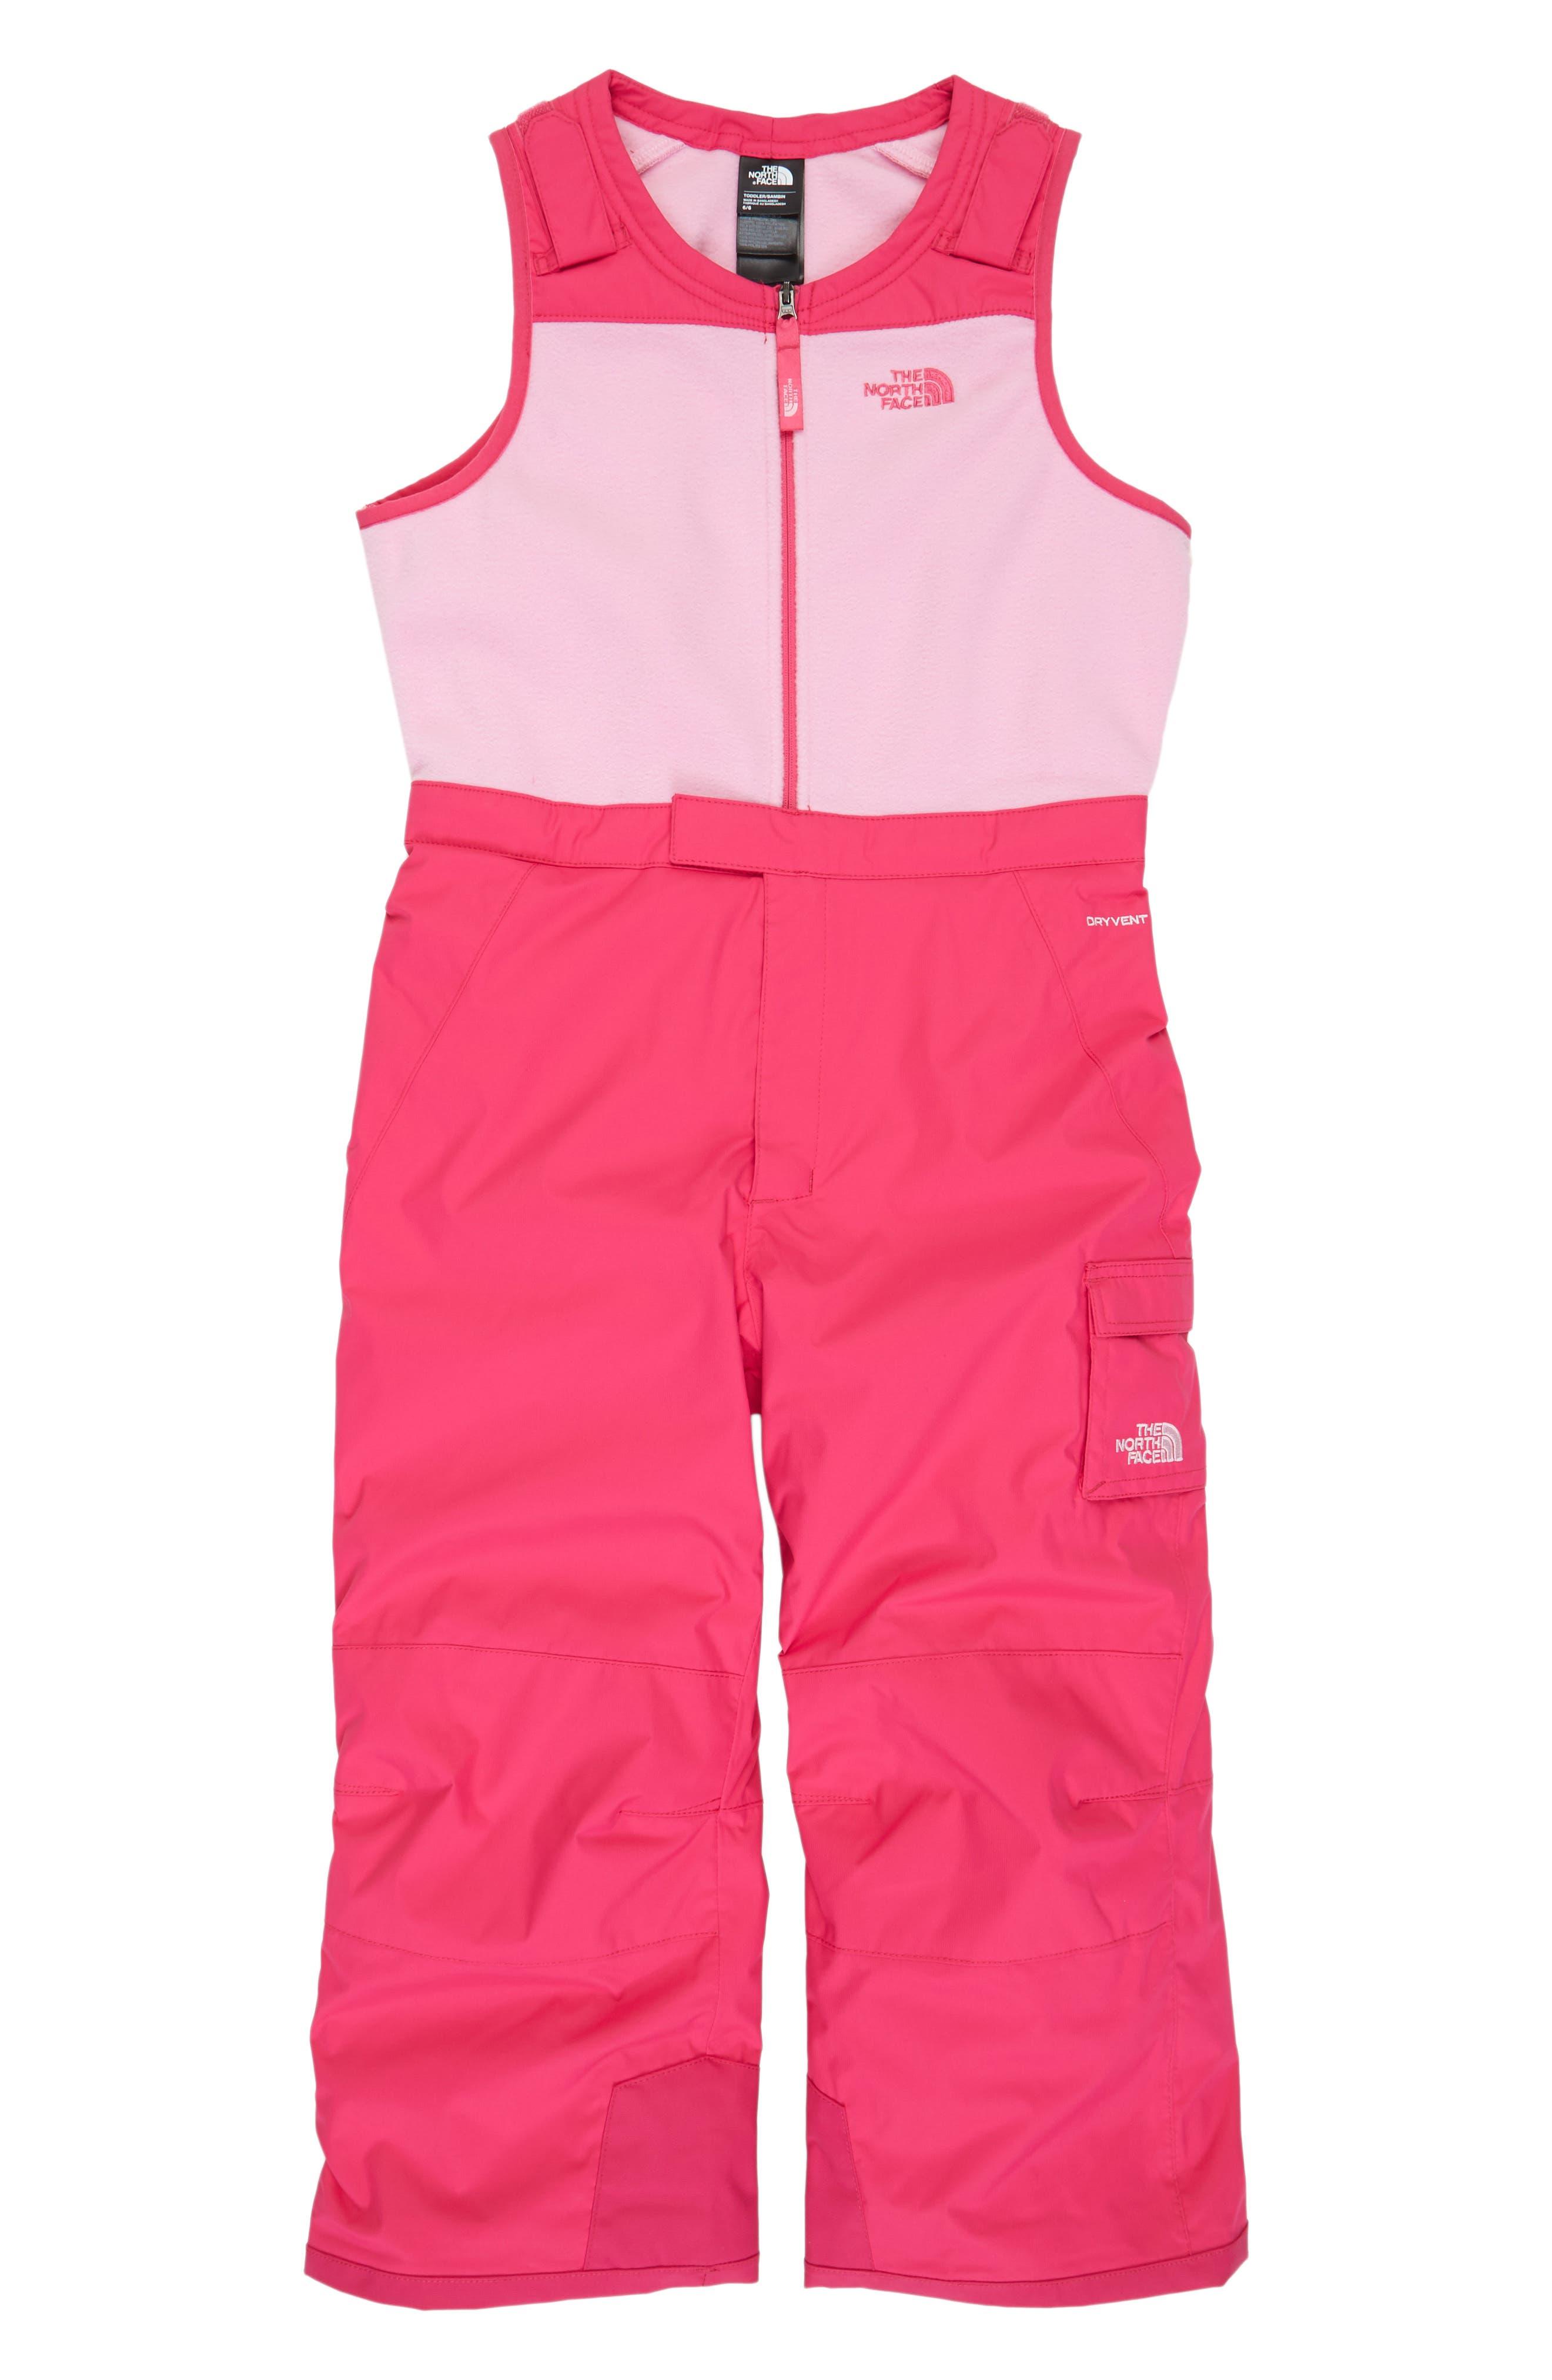 Alternate Image 1 Selected - The North Face Heatseeker™ Insulated Waterproof Bib Snowsuit (Toddler Girls & Little Girls)